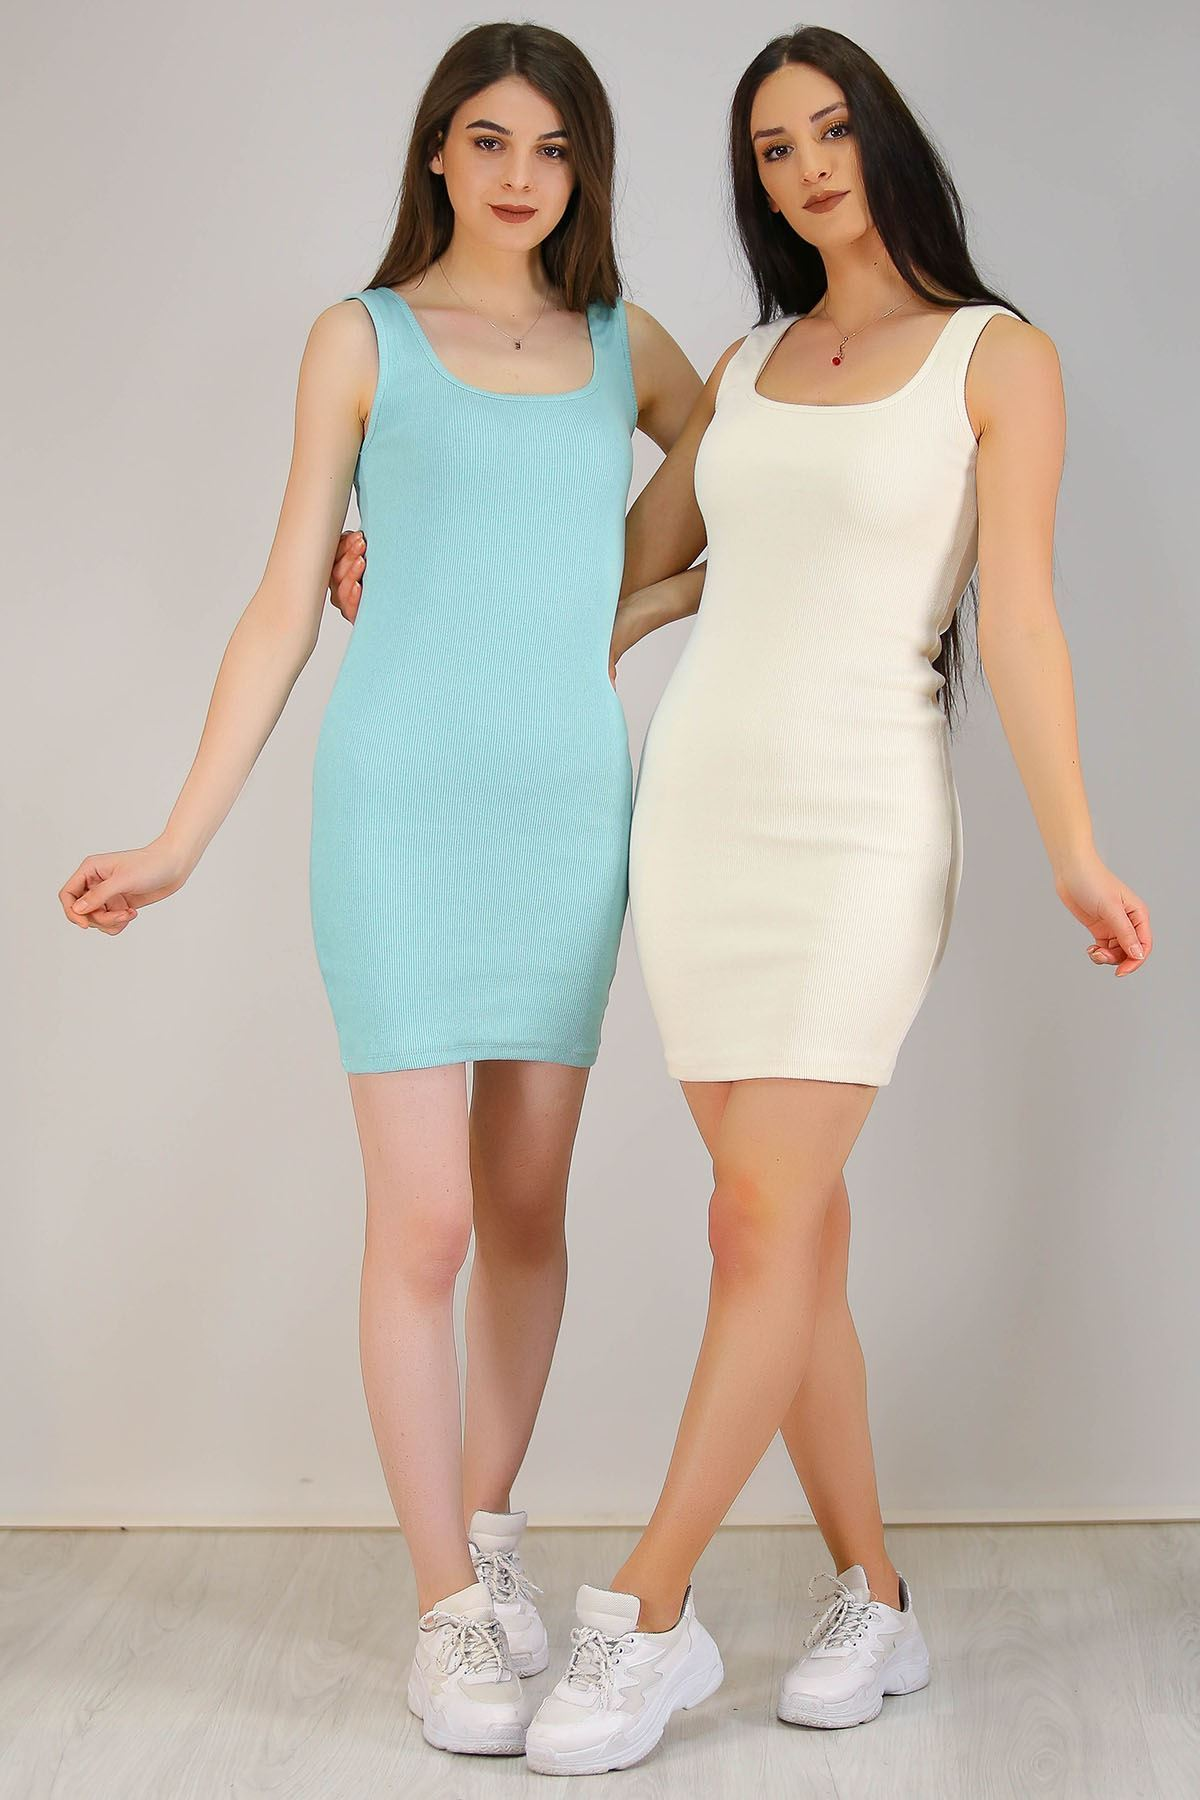 Kaşkorse Sıfır Kol Elbise Mint - 5188.316.